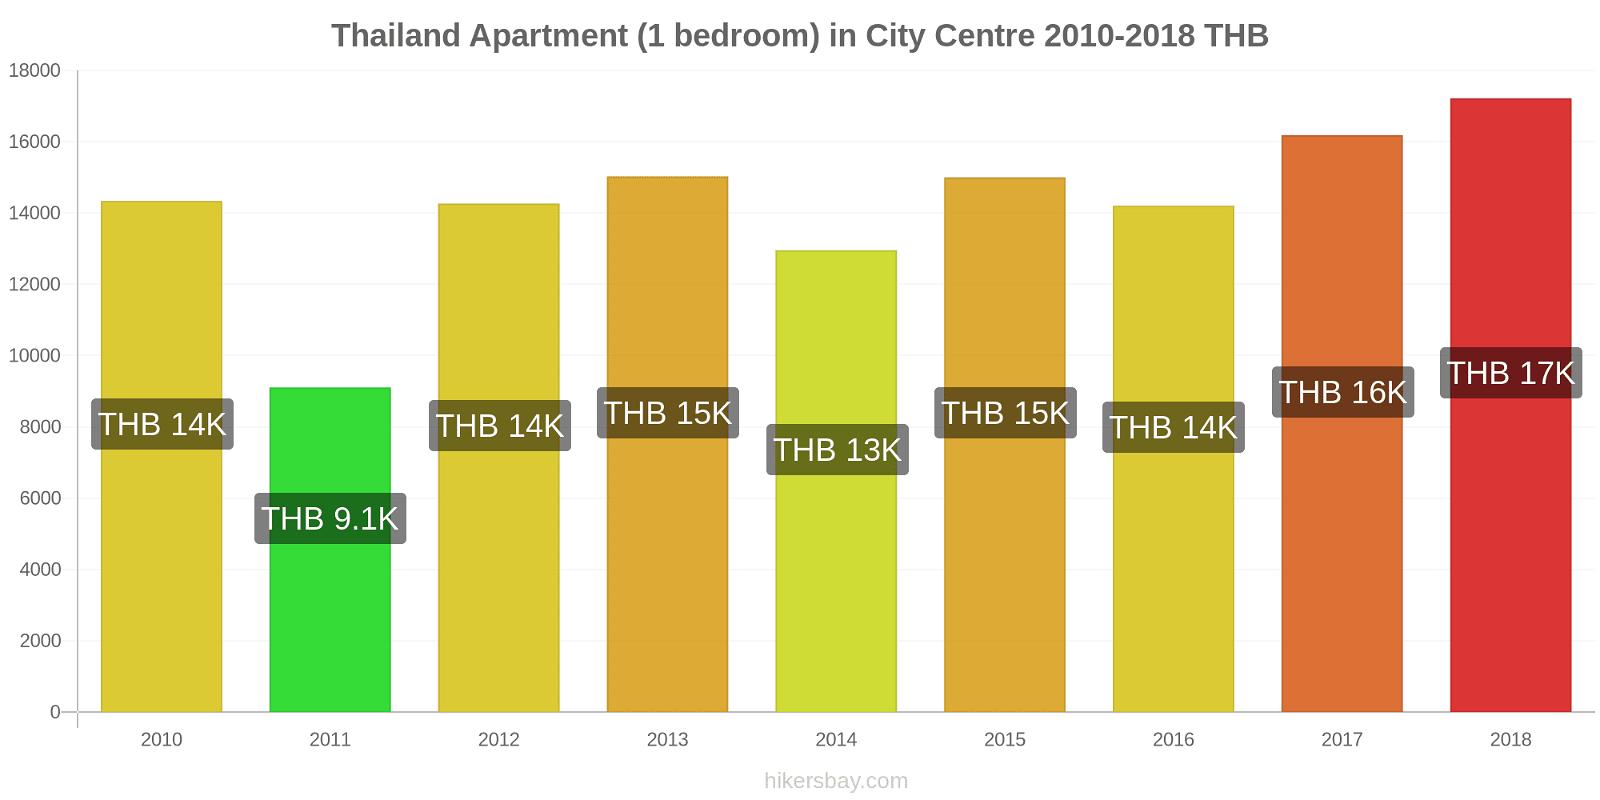 Thailand price changes Apartment (1 bedroom) in City Centre hikersbay.com